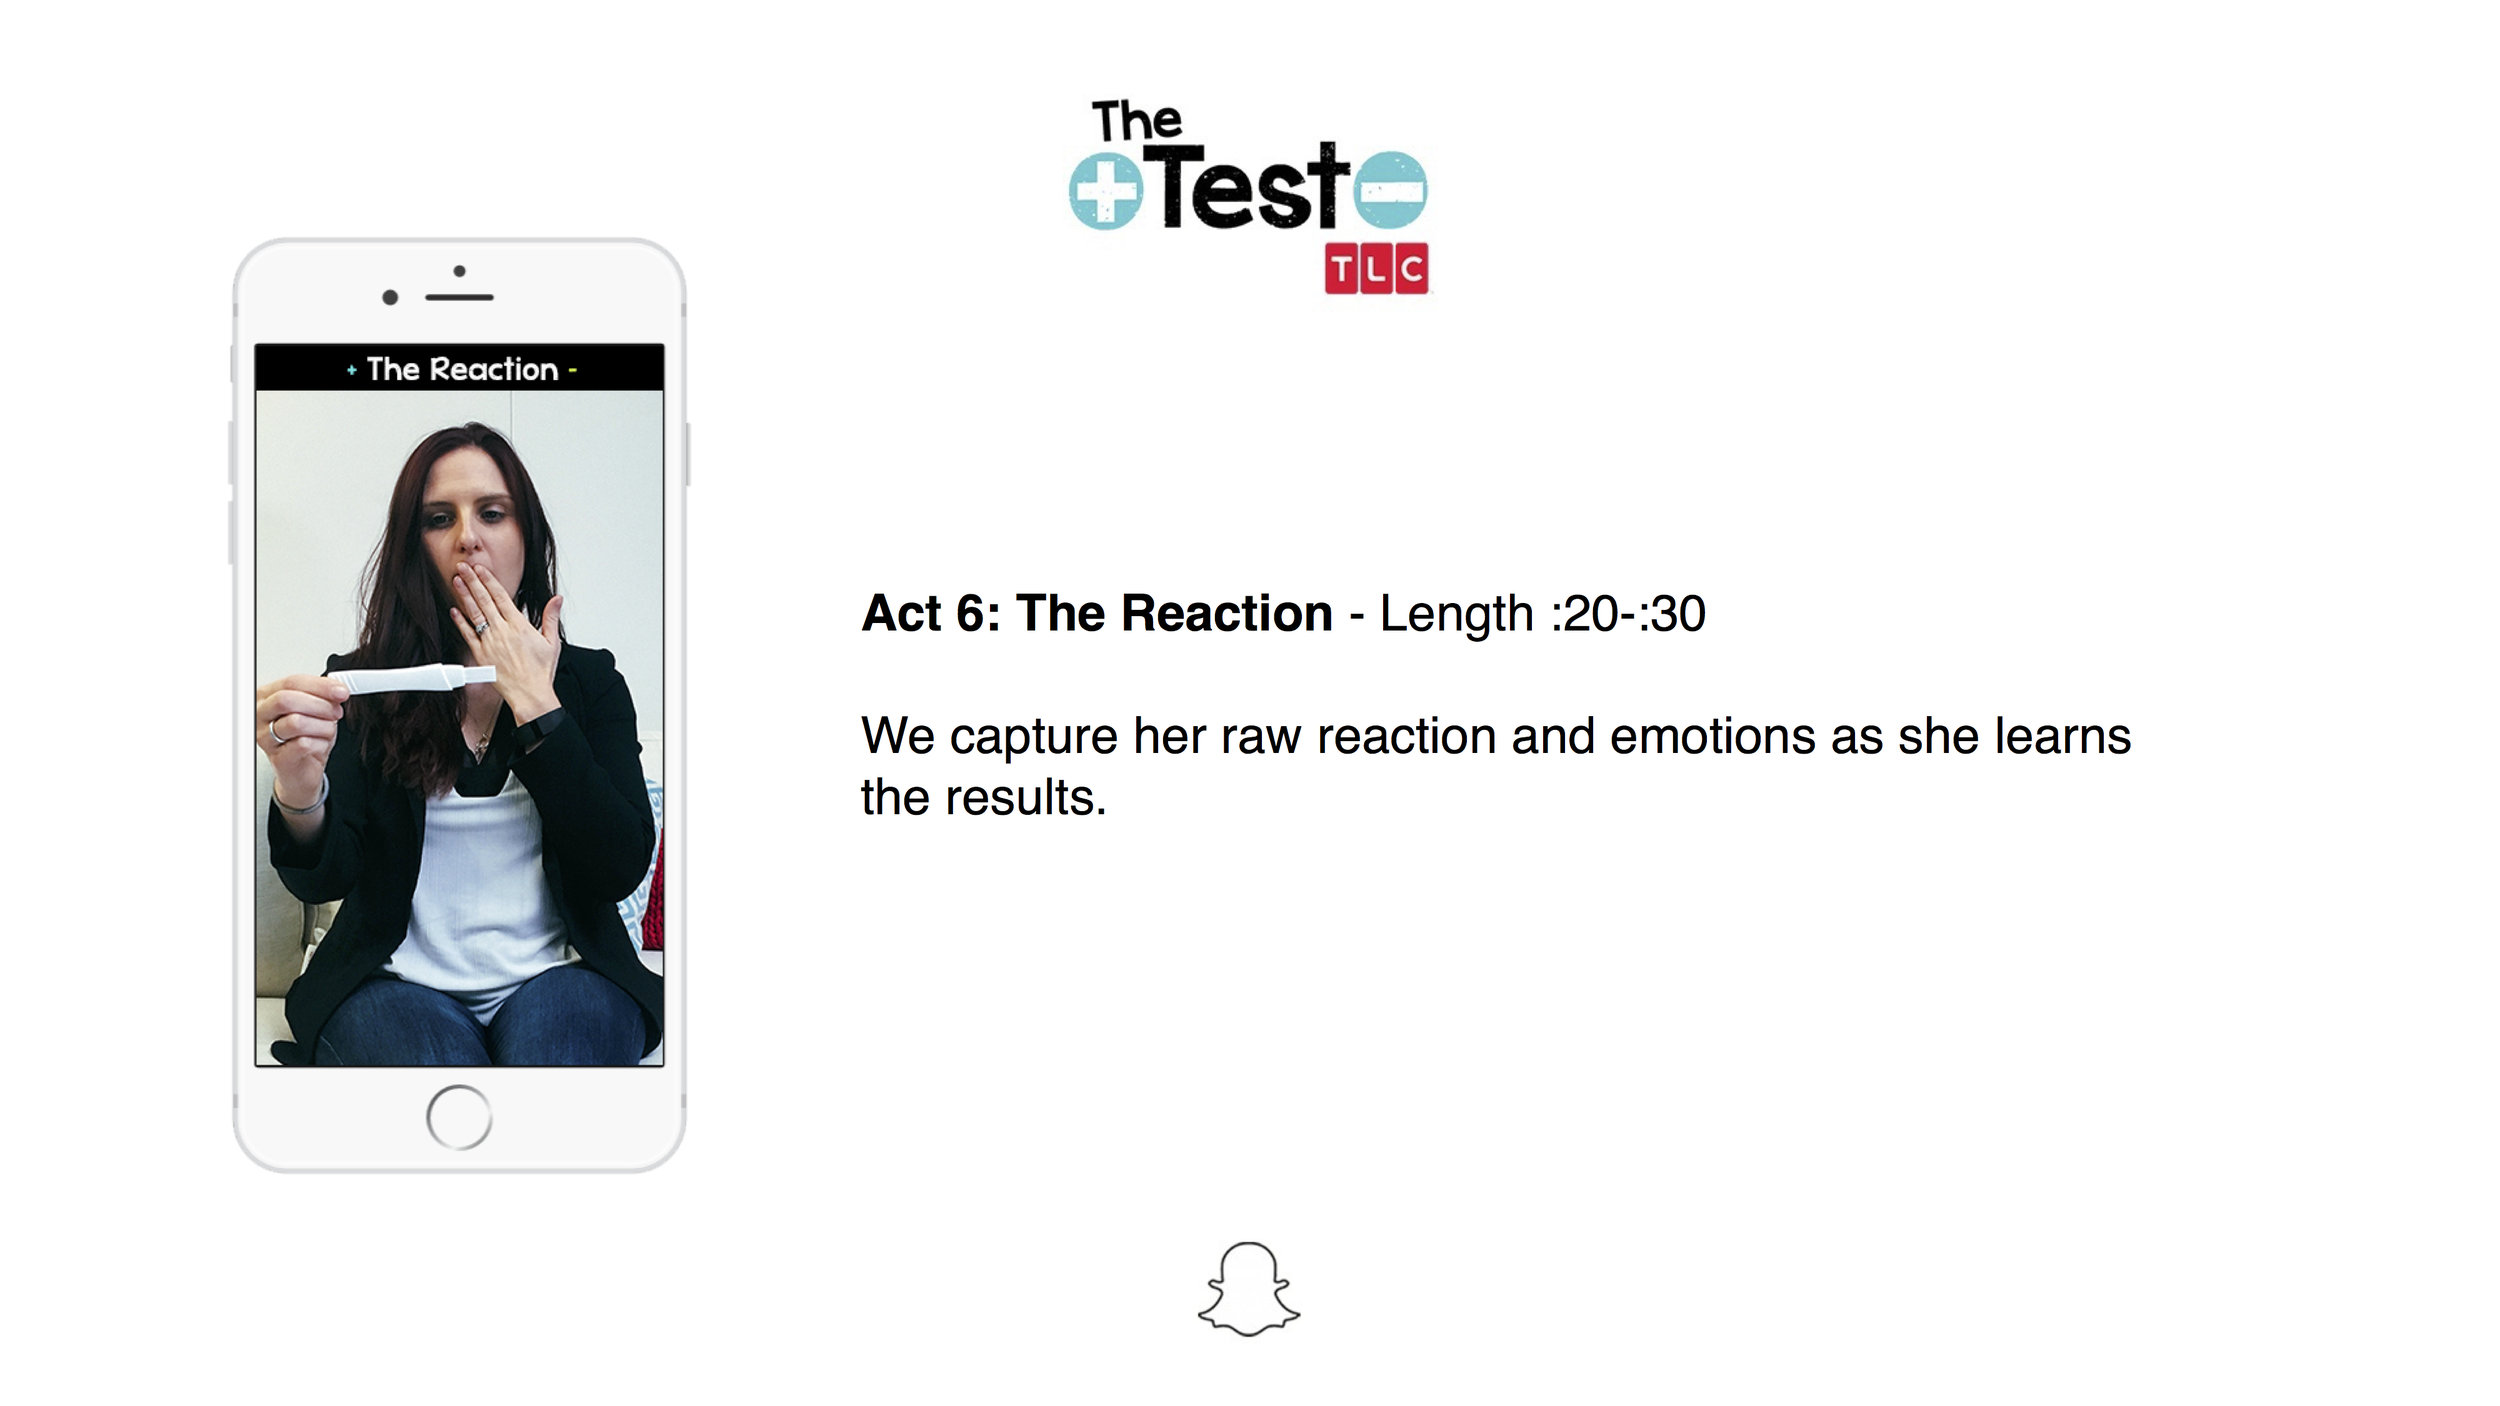 TLC_TEST_R5_pg9.jpg